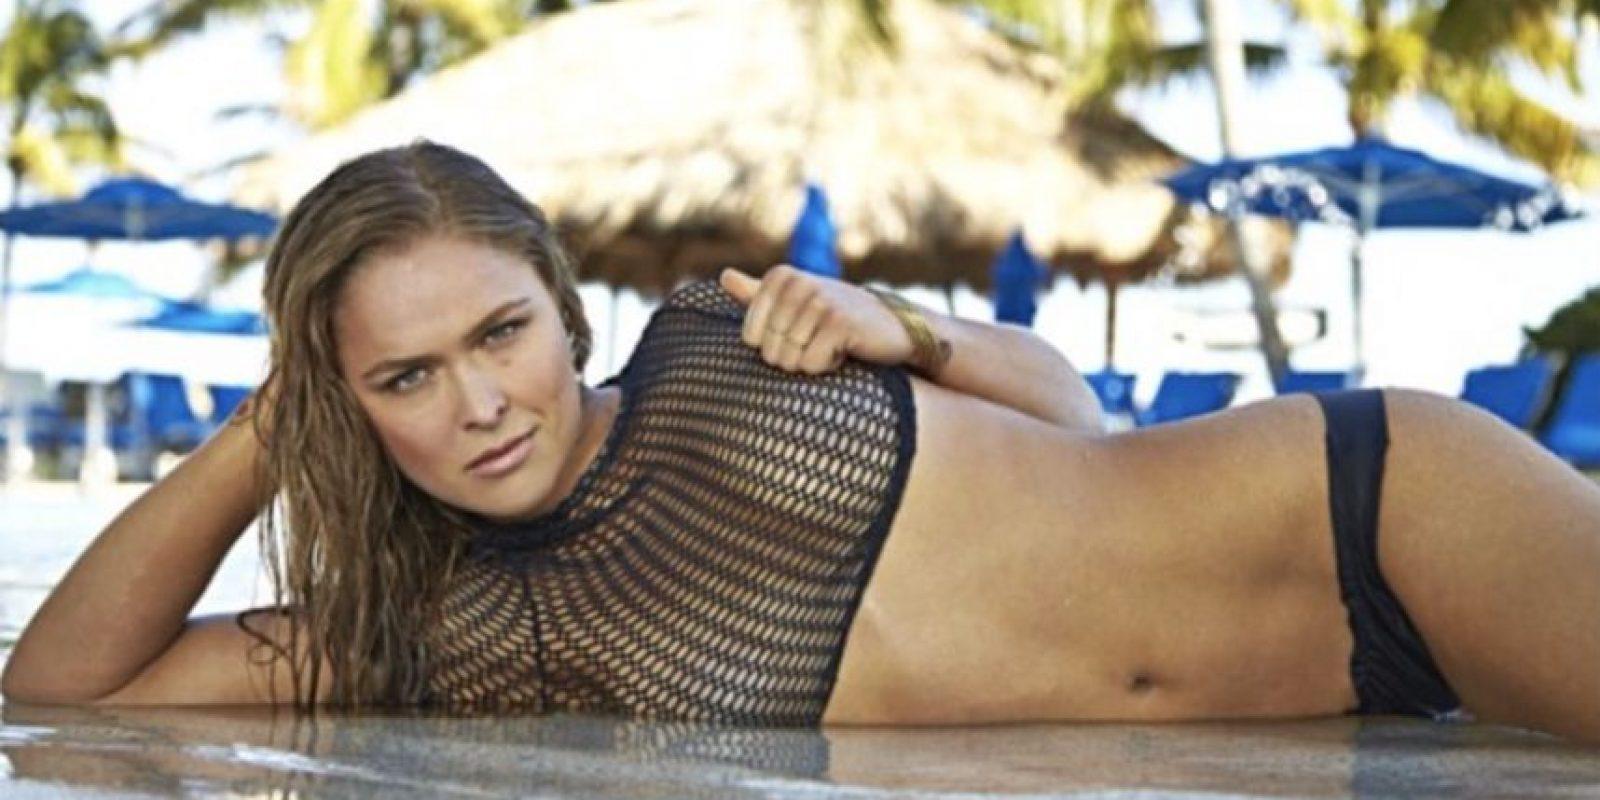 5. Ronda Rousey Foto:Vía instagram.com/rondarousey